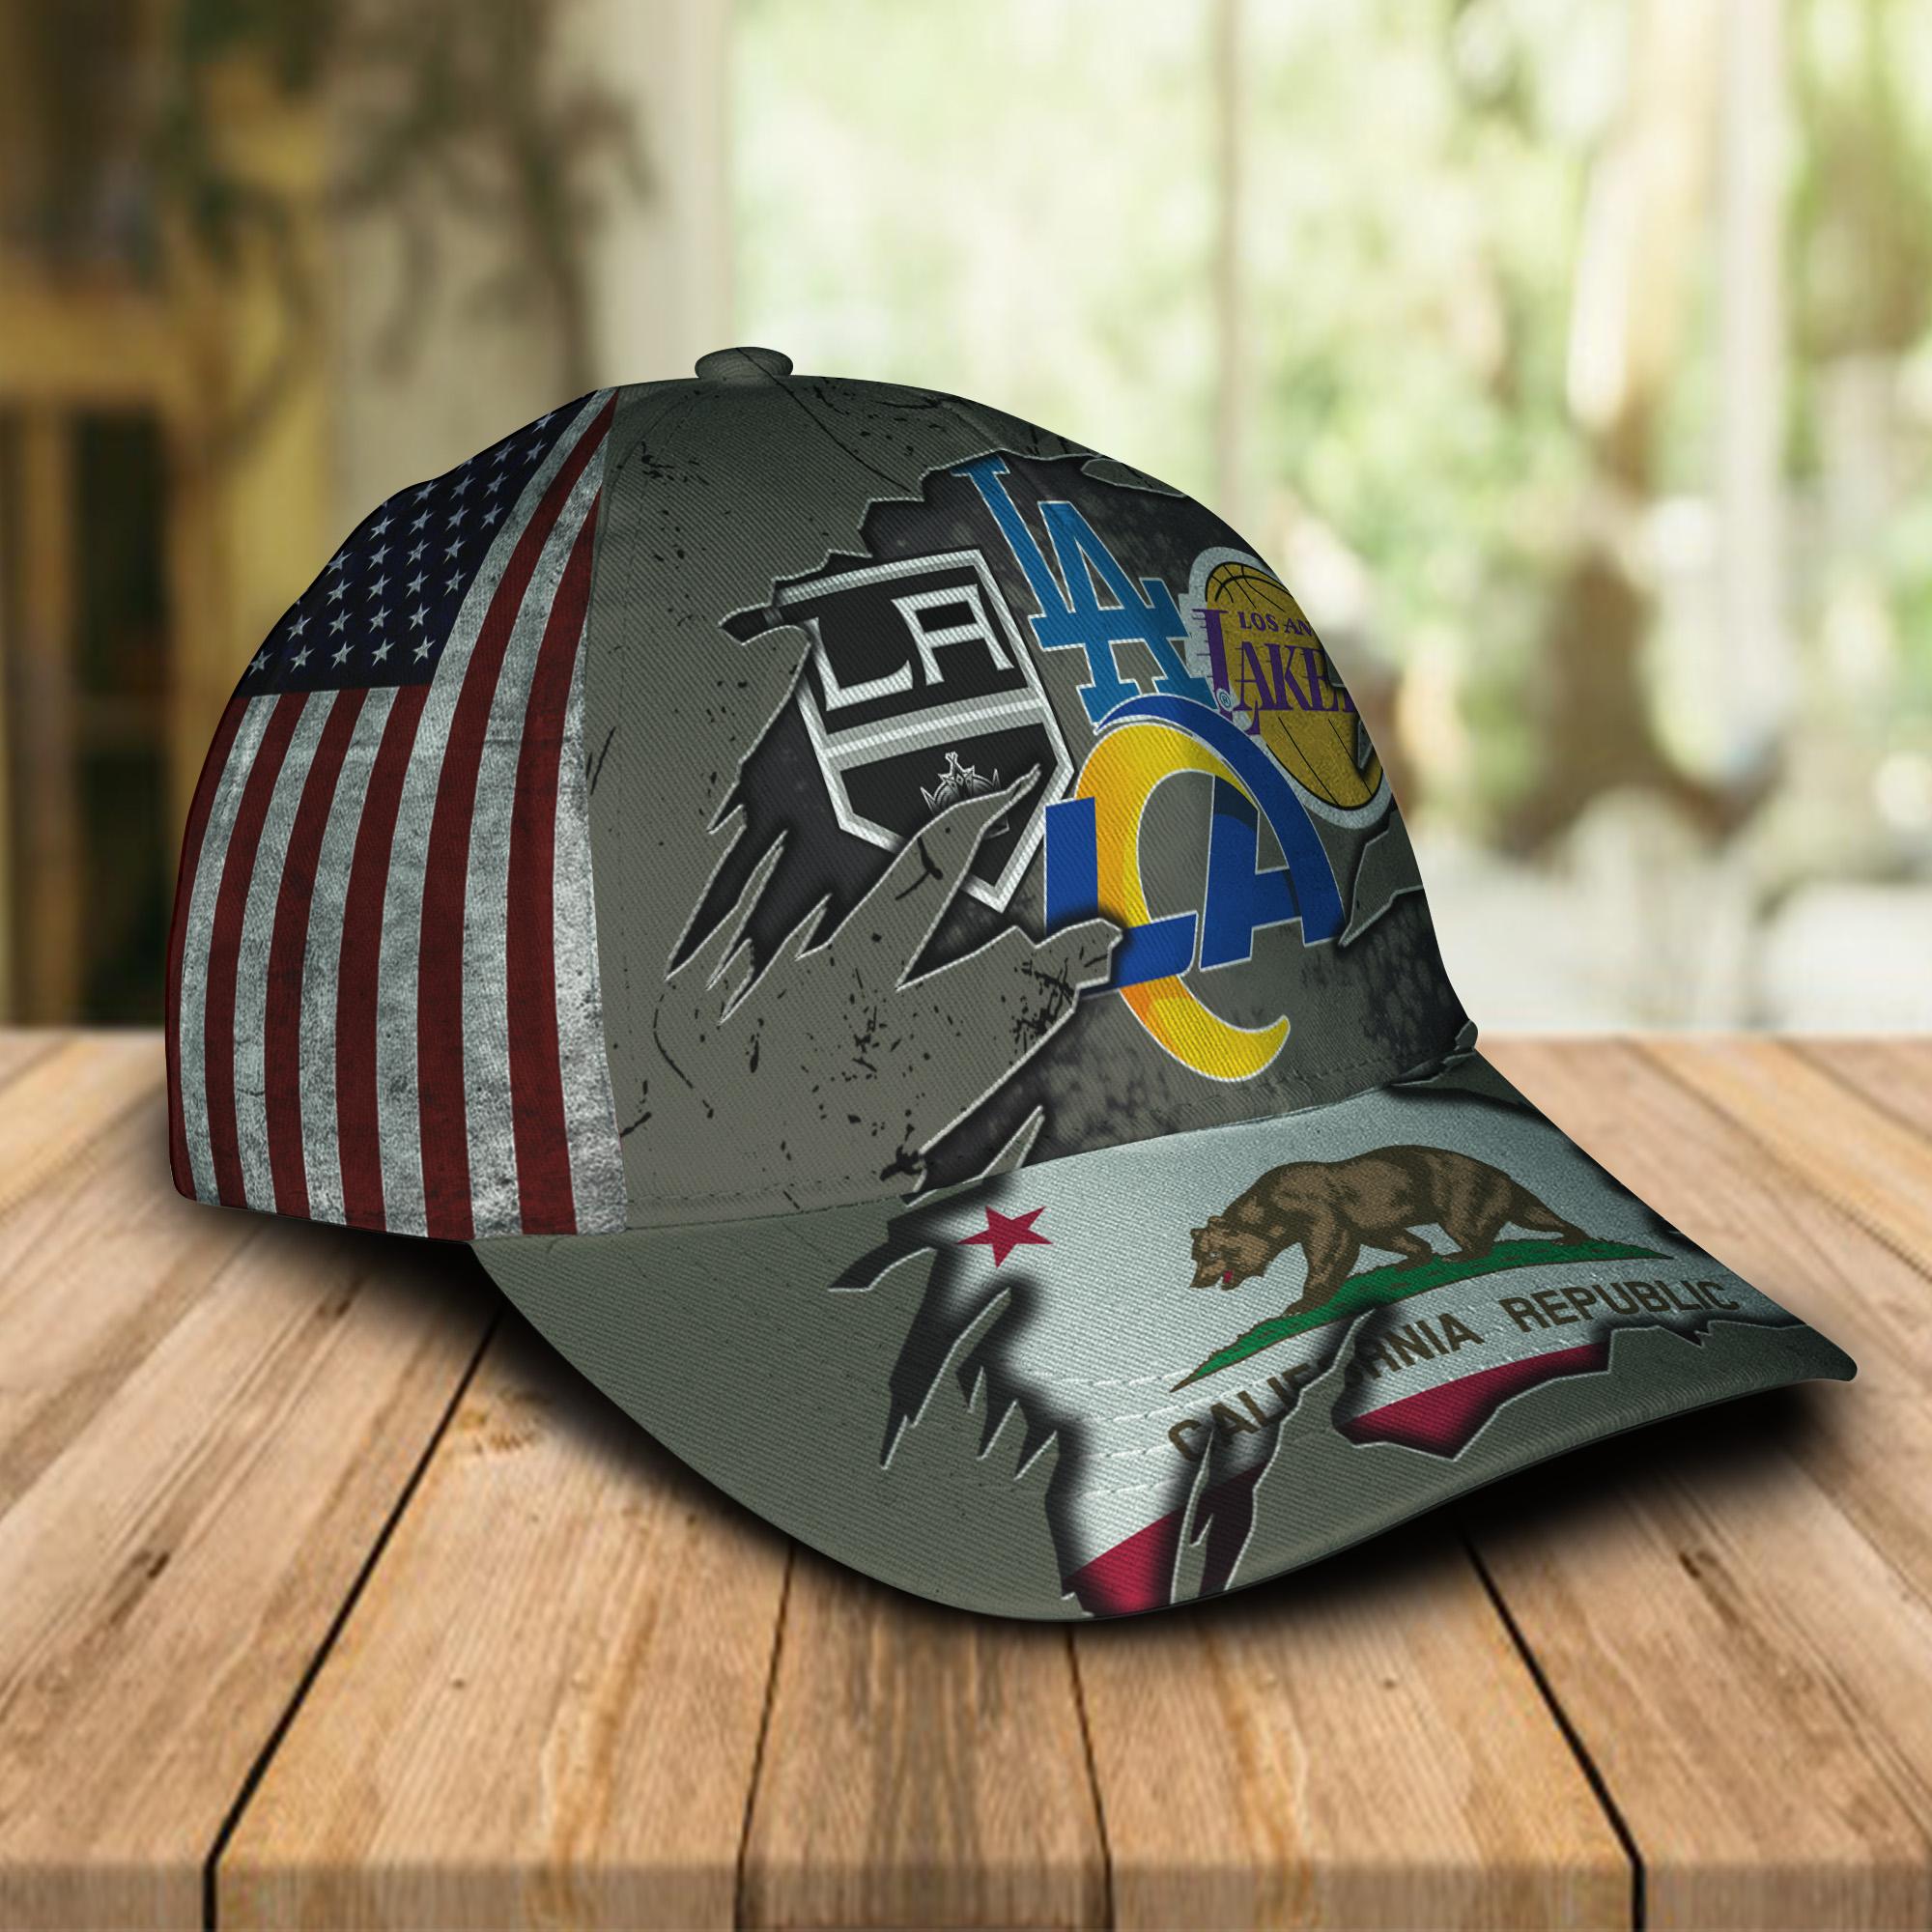 California republic Los Angeles Dodgers LA Kings LA Lakers LA Rams cap 1